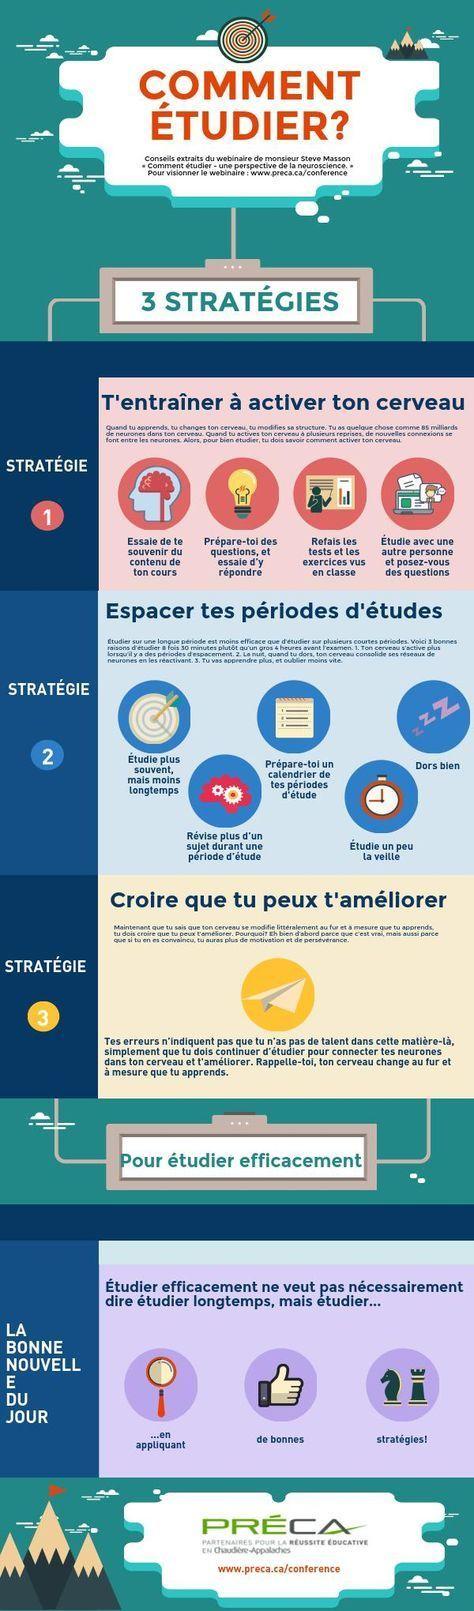 Comment étudier? | Piktochart Infographic Editor